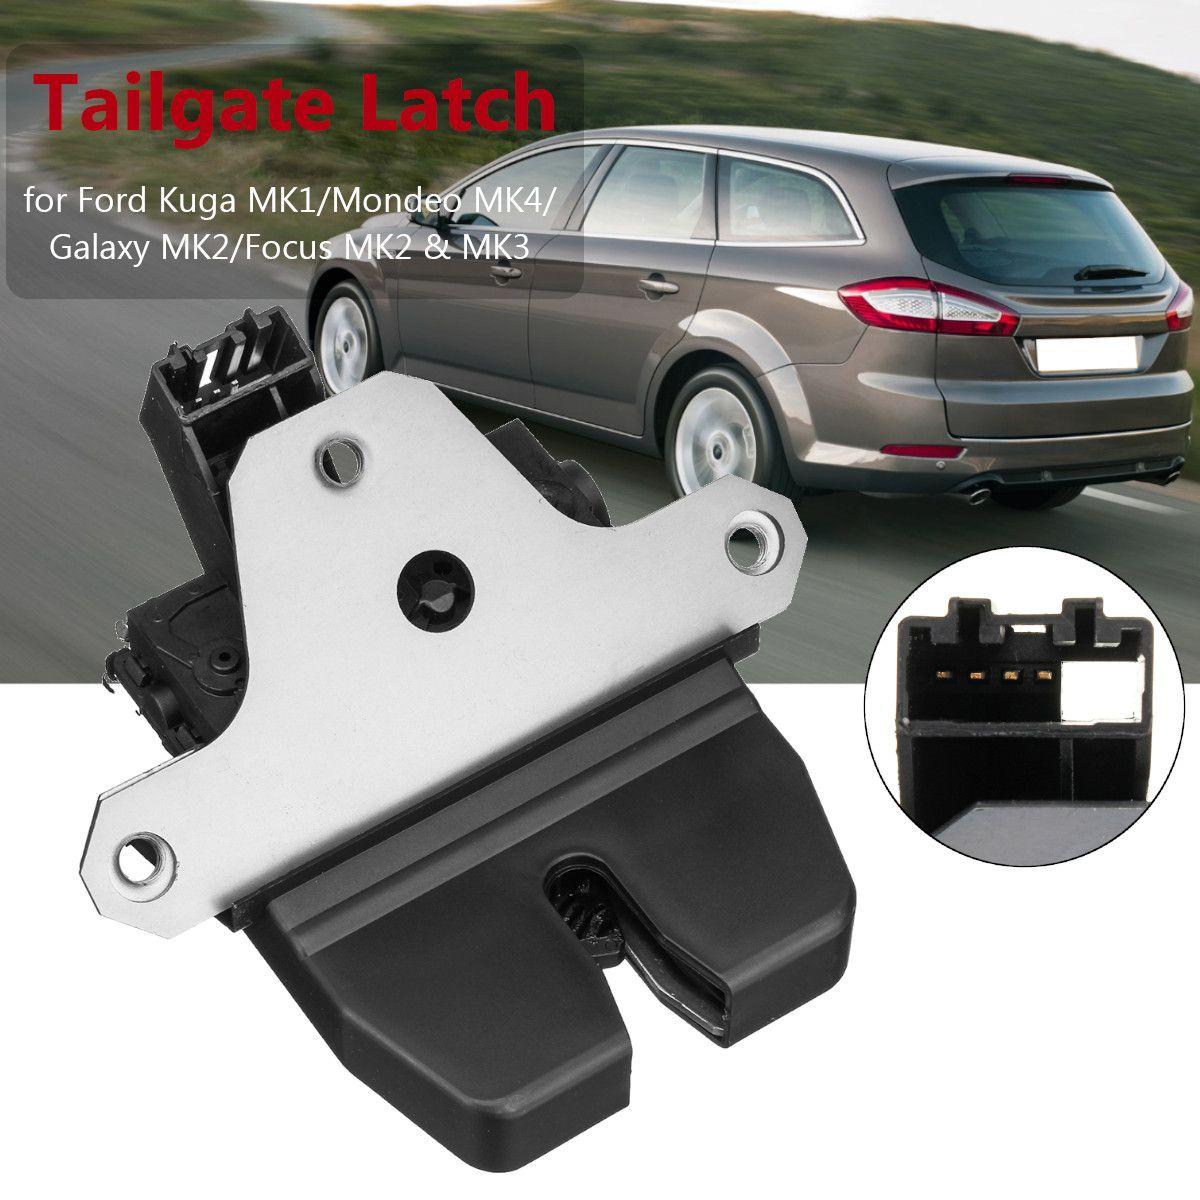 4Pin Tailgate Trunk Lock Latch For Ford Kuga MK1/Mondeo MK4/Galaxy MK2/Focus MK2 & MK3 1920840 1856670 8M51 R442A66DC